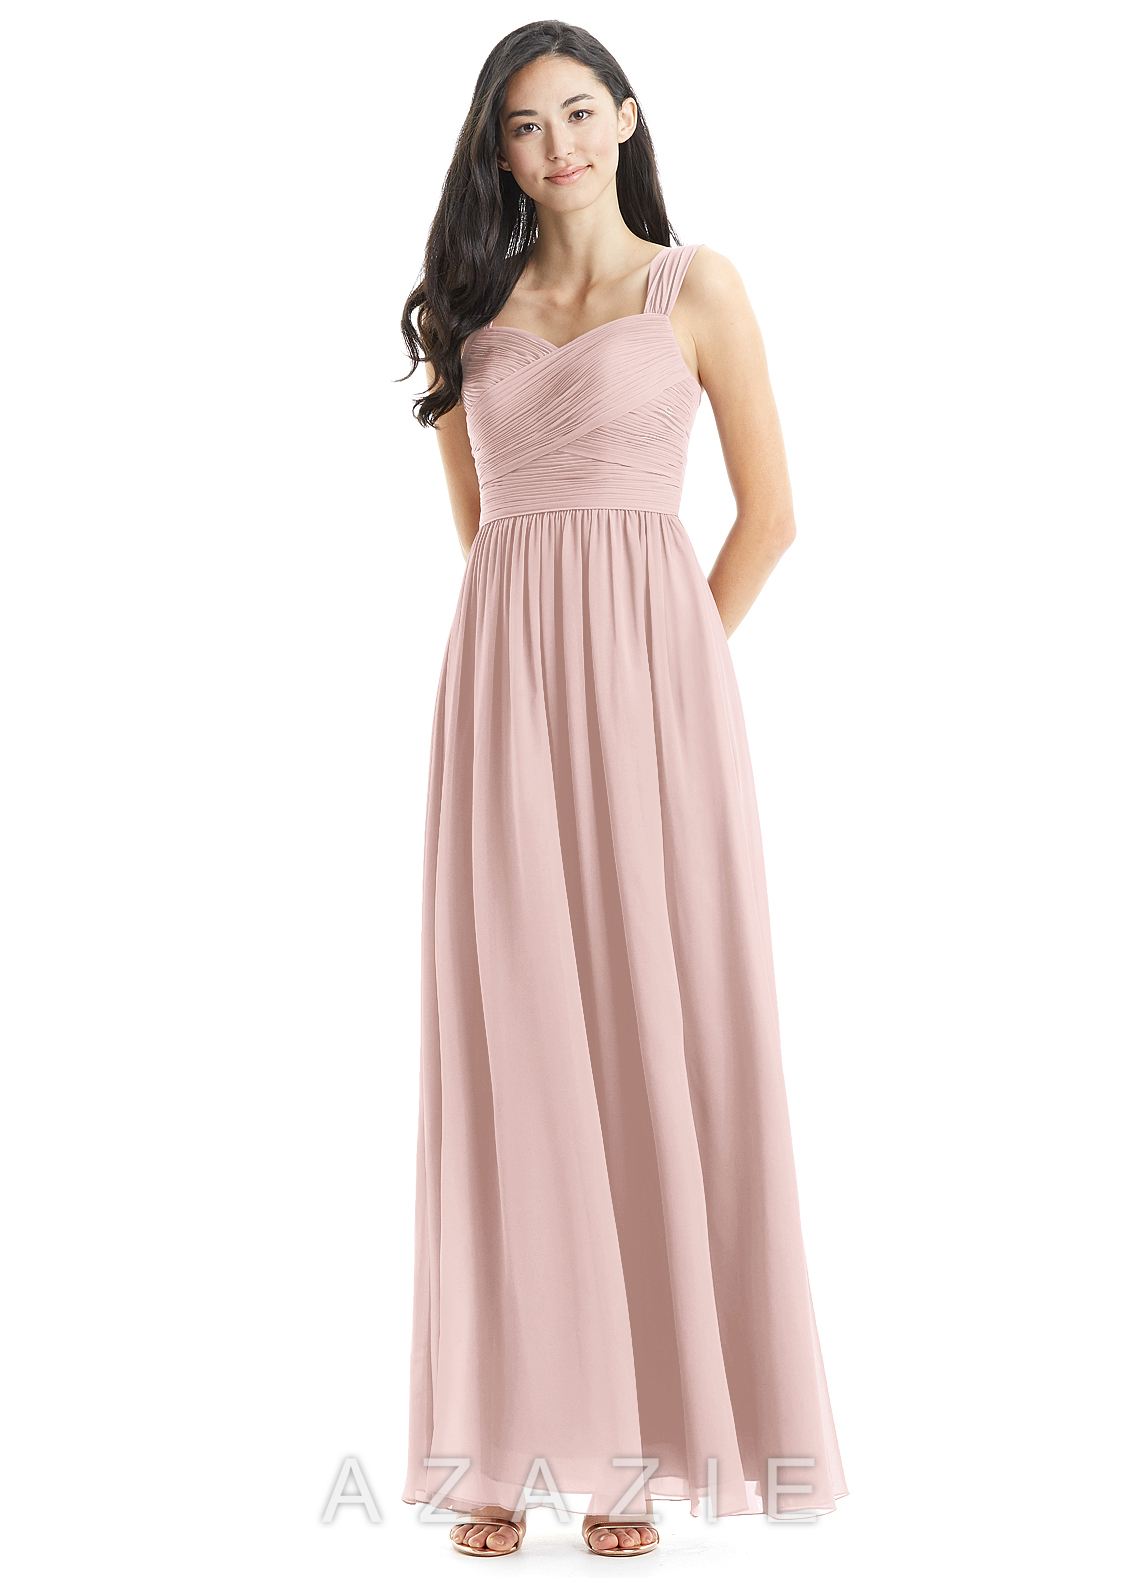 maternity wedding dresses under 100 dollars » Wedding Dresses ...